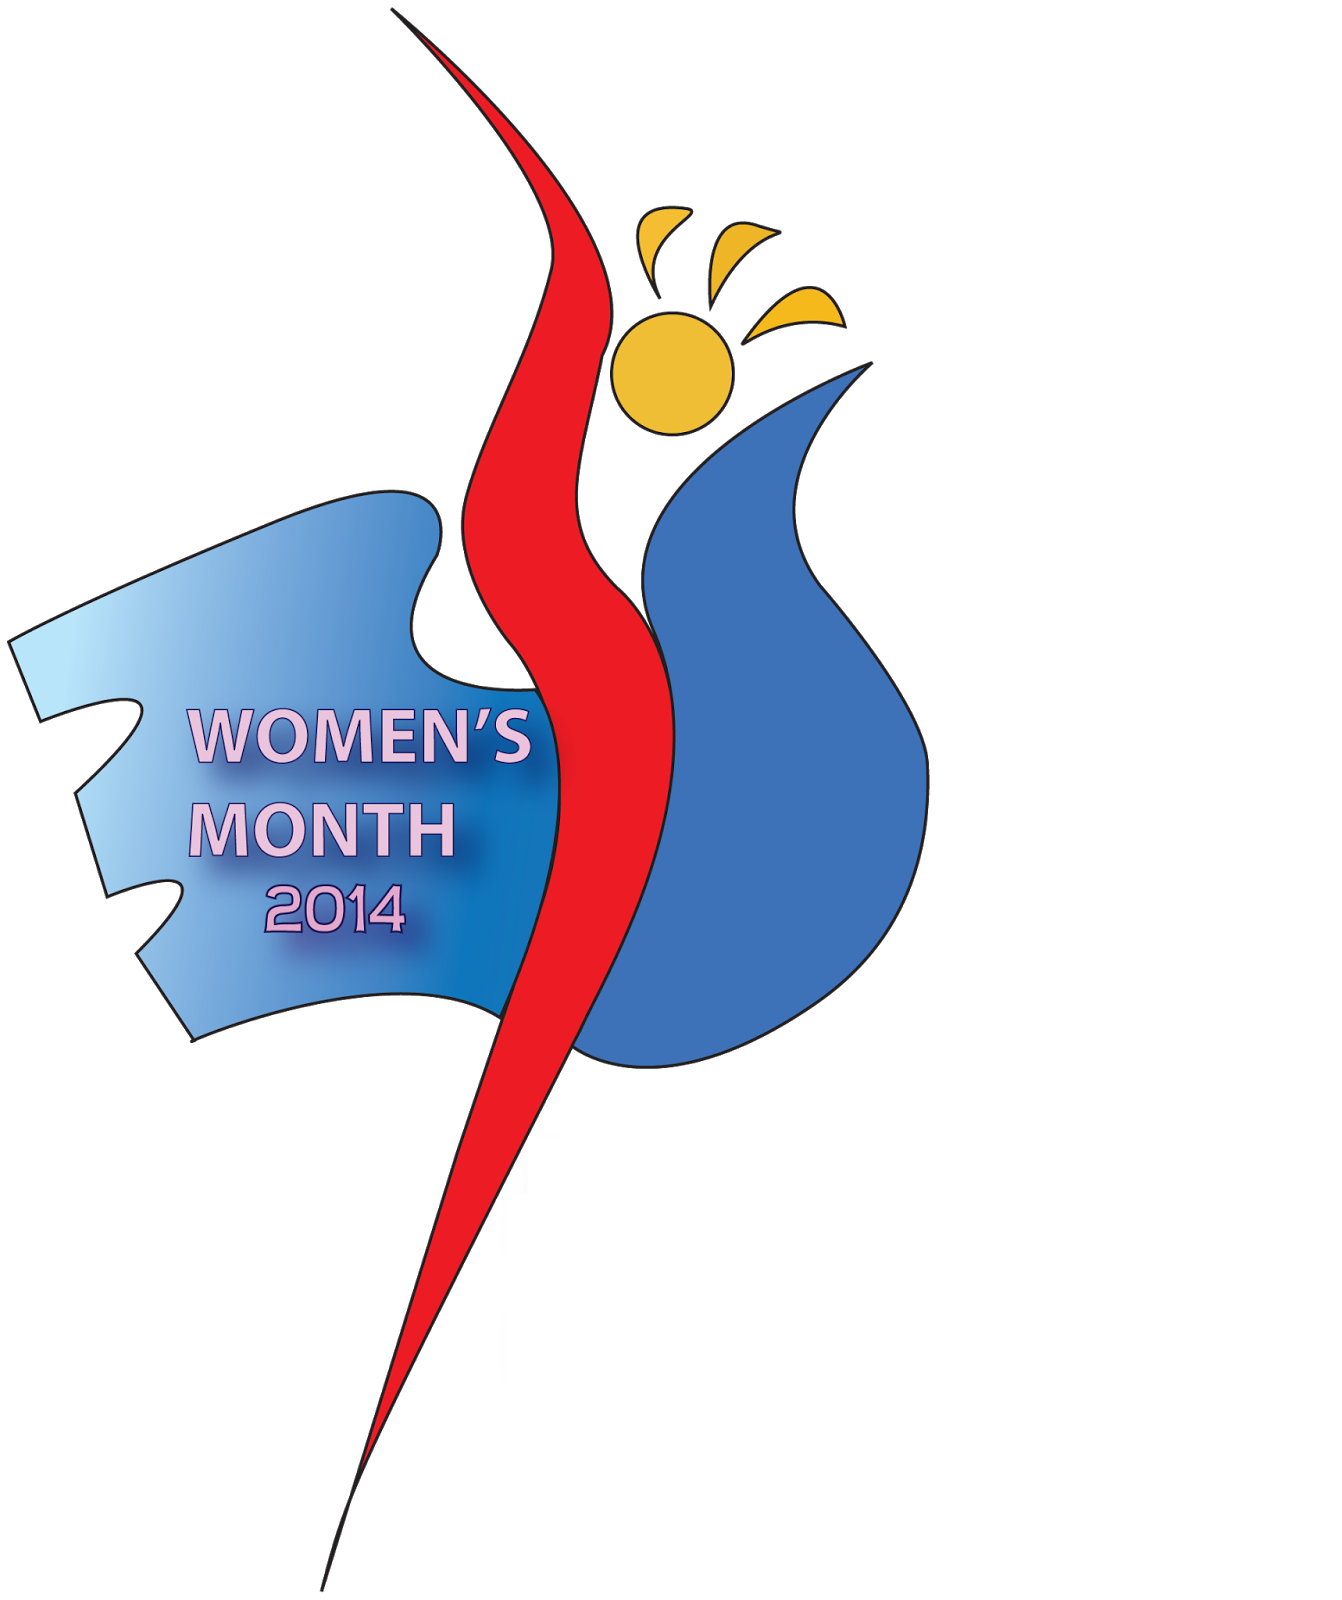 Women's Month 2014 Logo